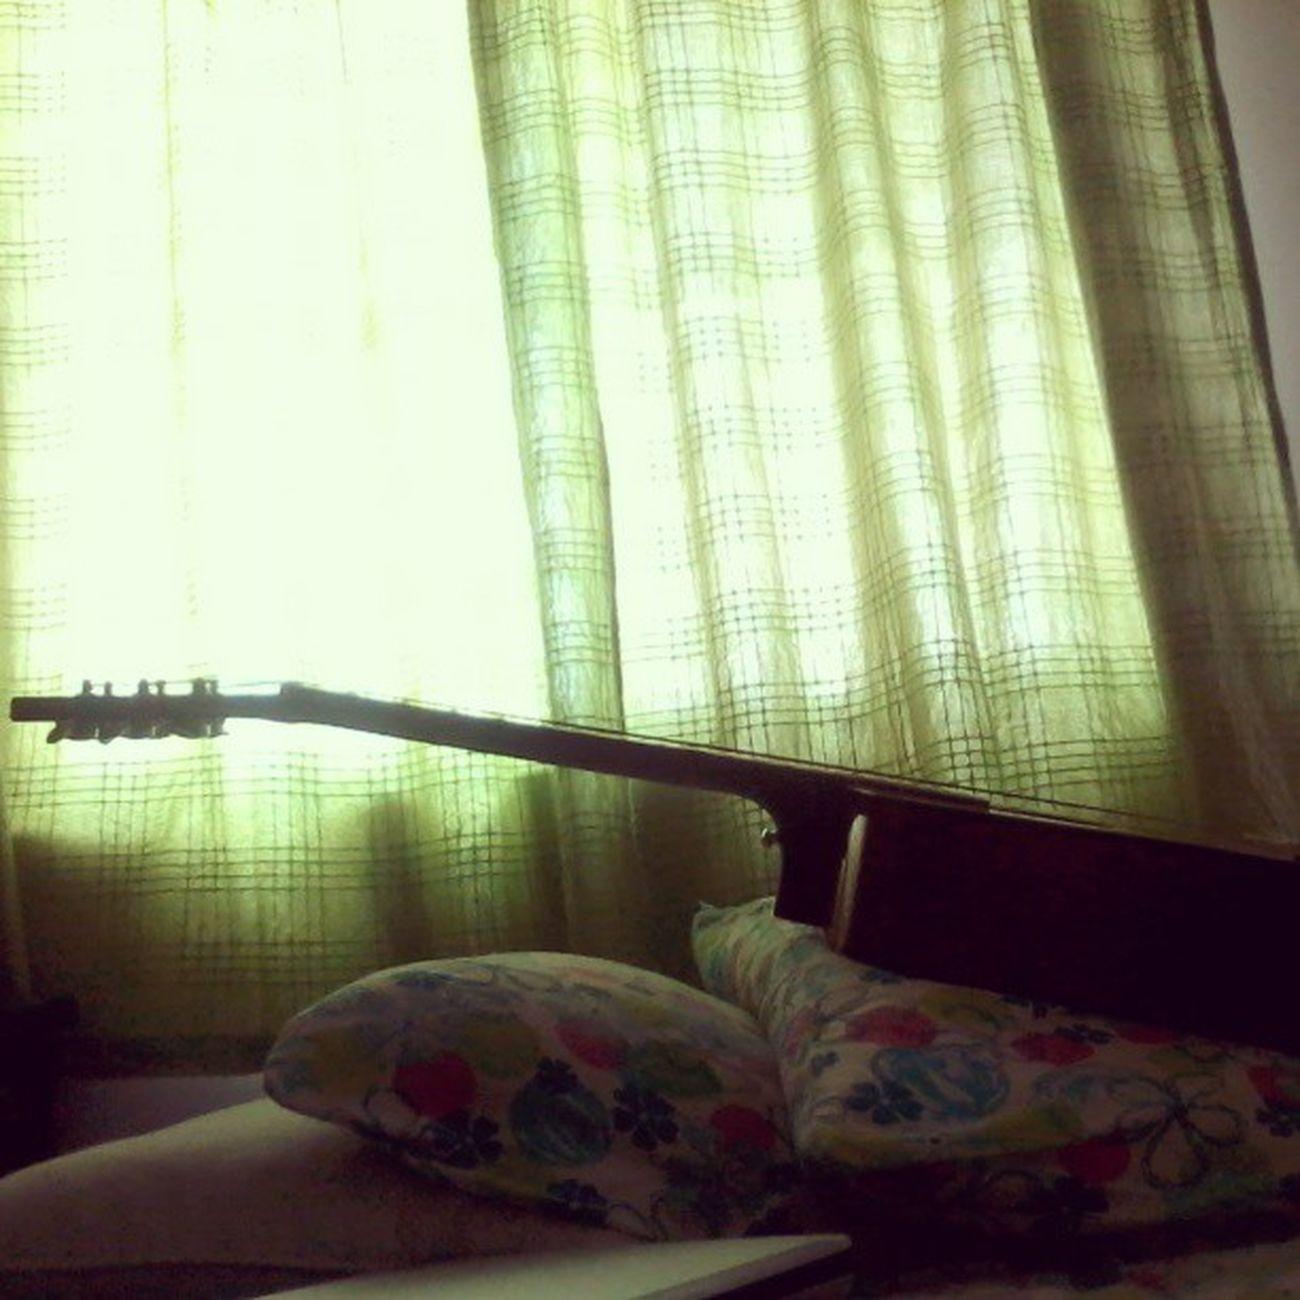 Idle Guitar! Guitar Acoustic Beautiful Love Idle València Instapic